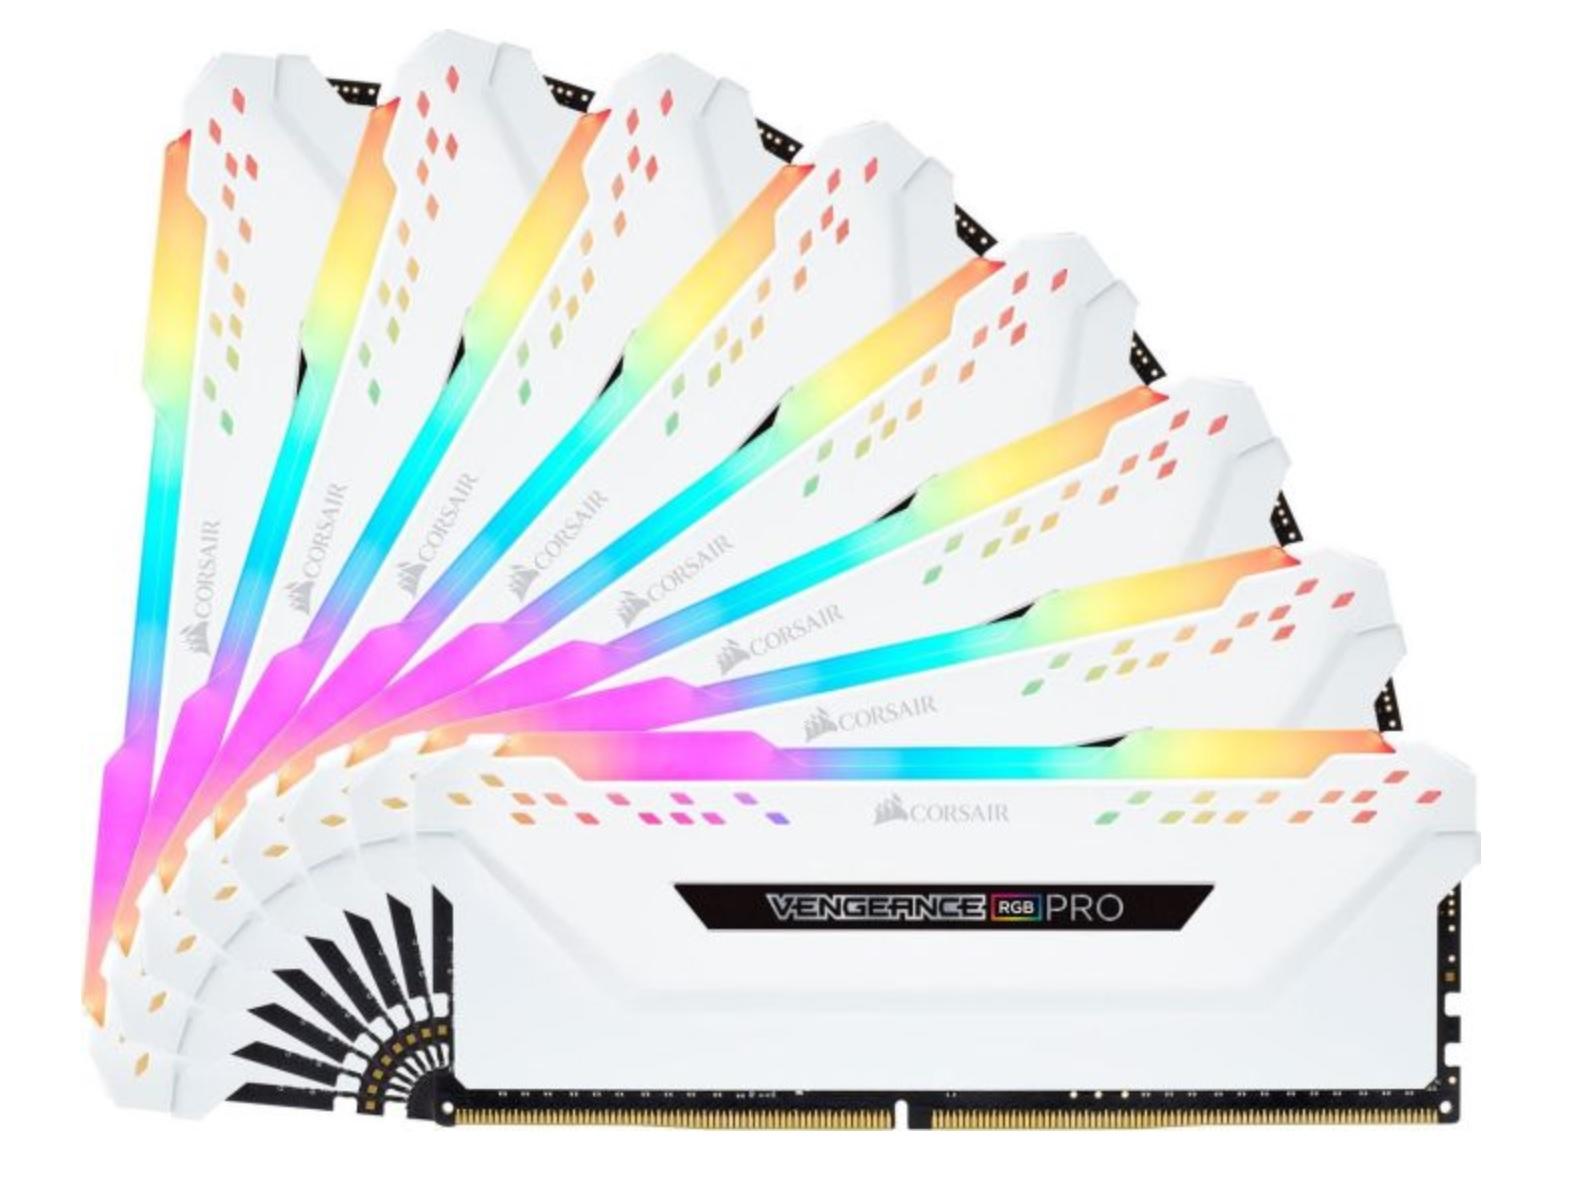 Corsair Vengeance RGB Pro Weiß 64GB Kit (8x8GB) DDR4-2666 CL16 DIMM Arbeitsspeicher